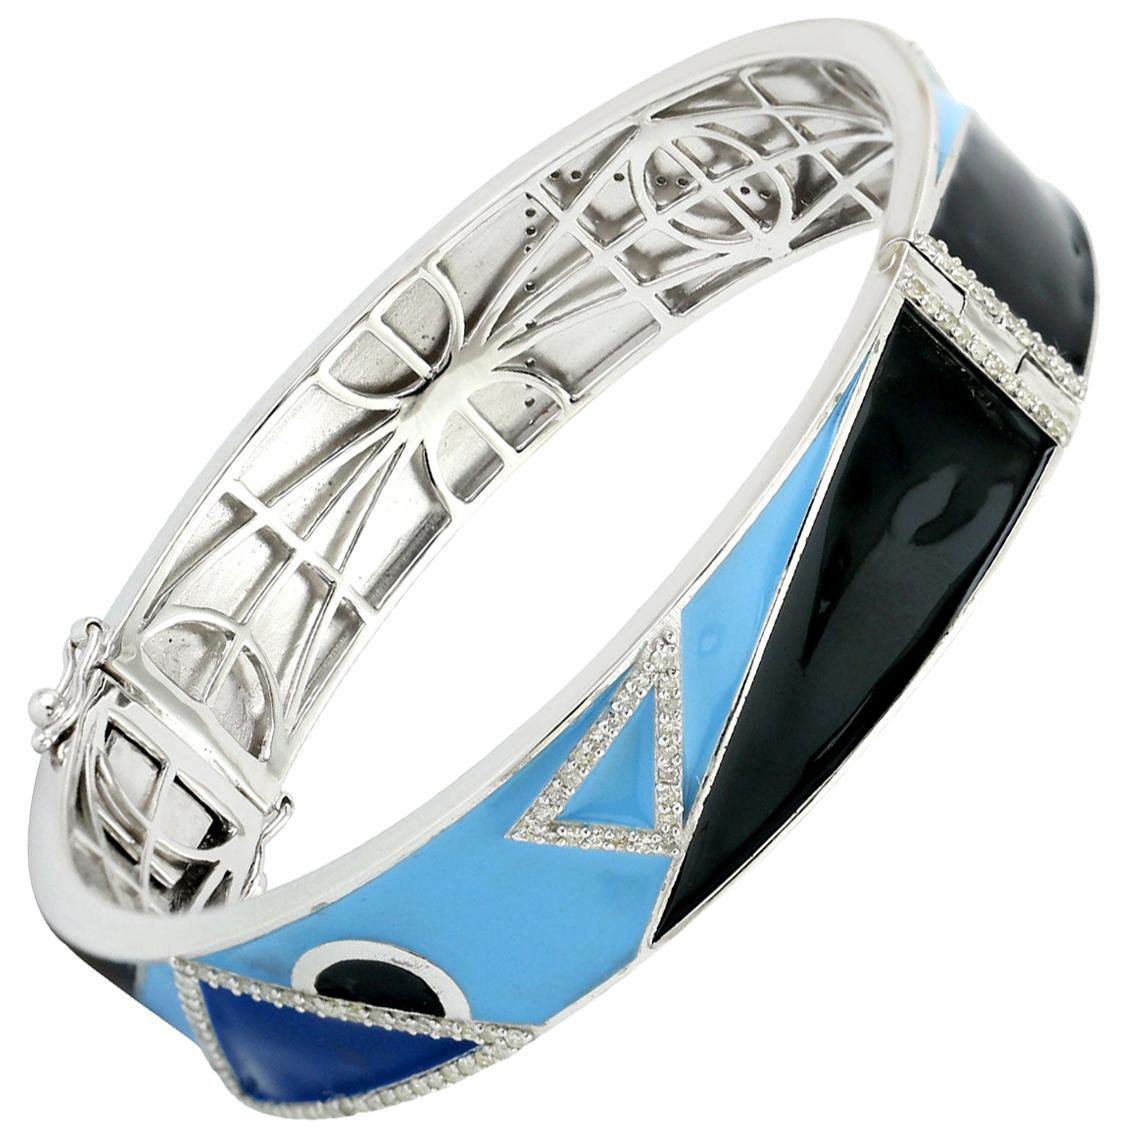 18 Karat Gold .925 Sterling Silver Diamond Pave Enamel Cuff Bangle Bracelet